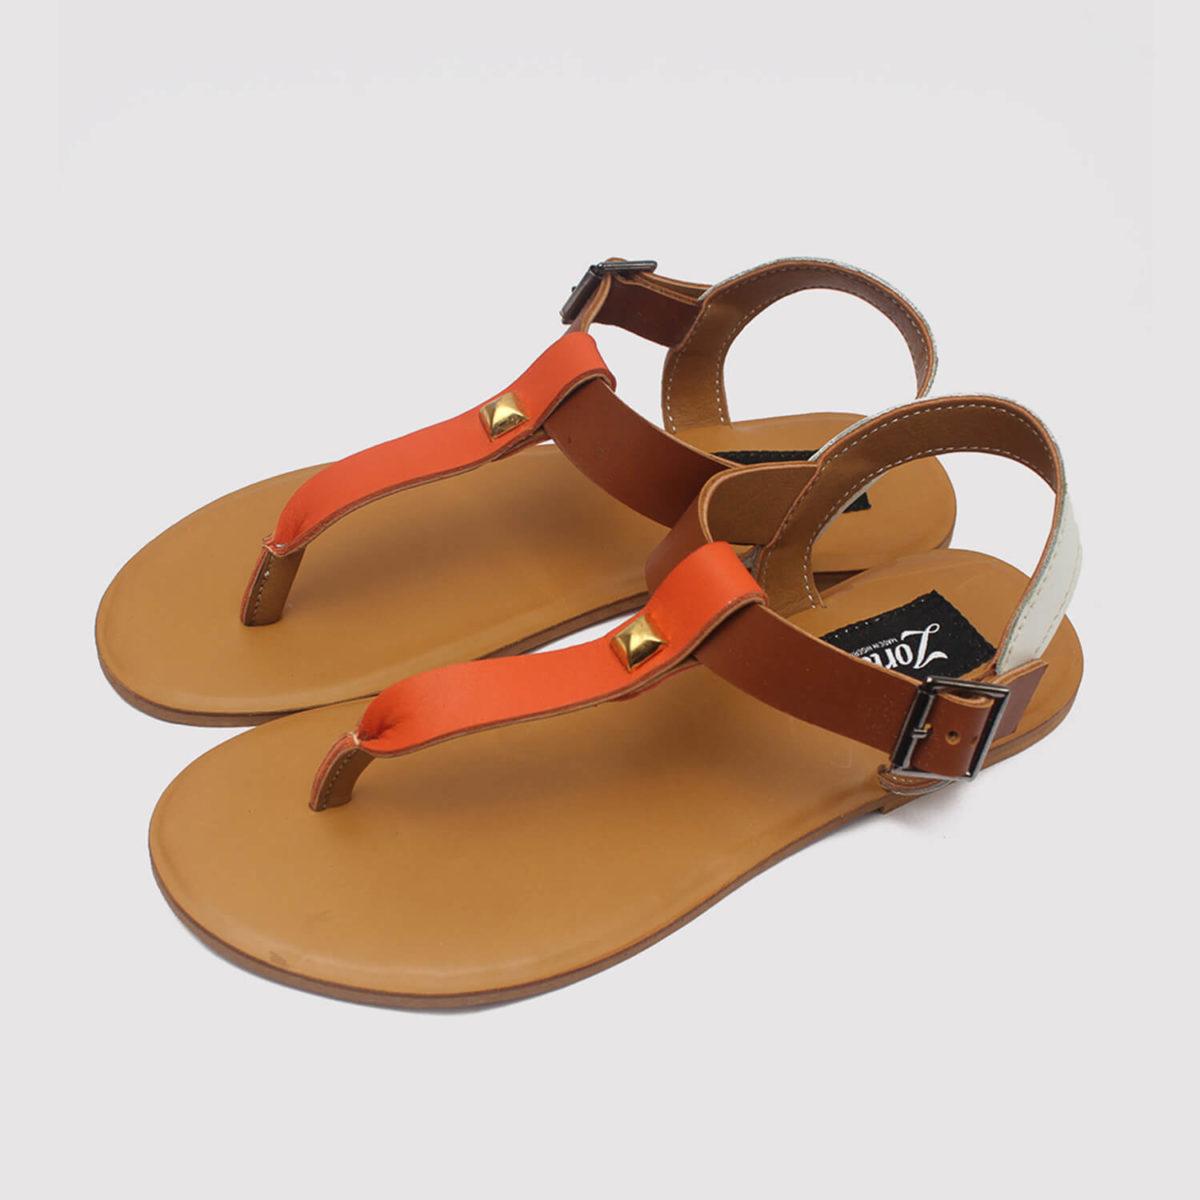 toke sandals orange brown white zorkle shoes in lagos nigeria